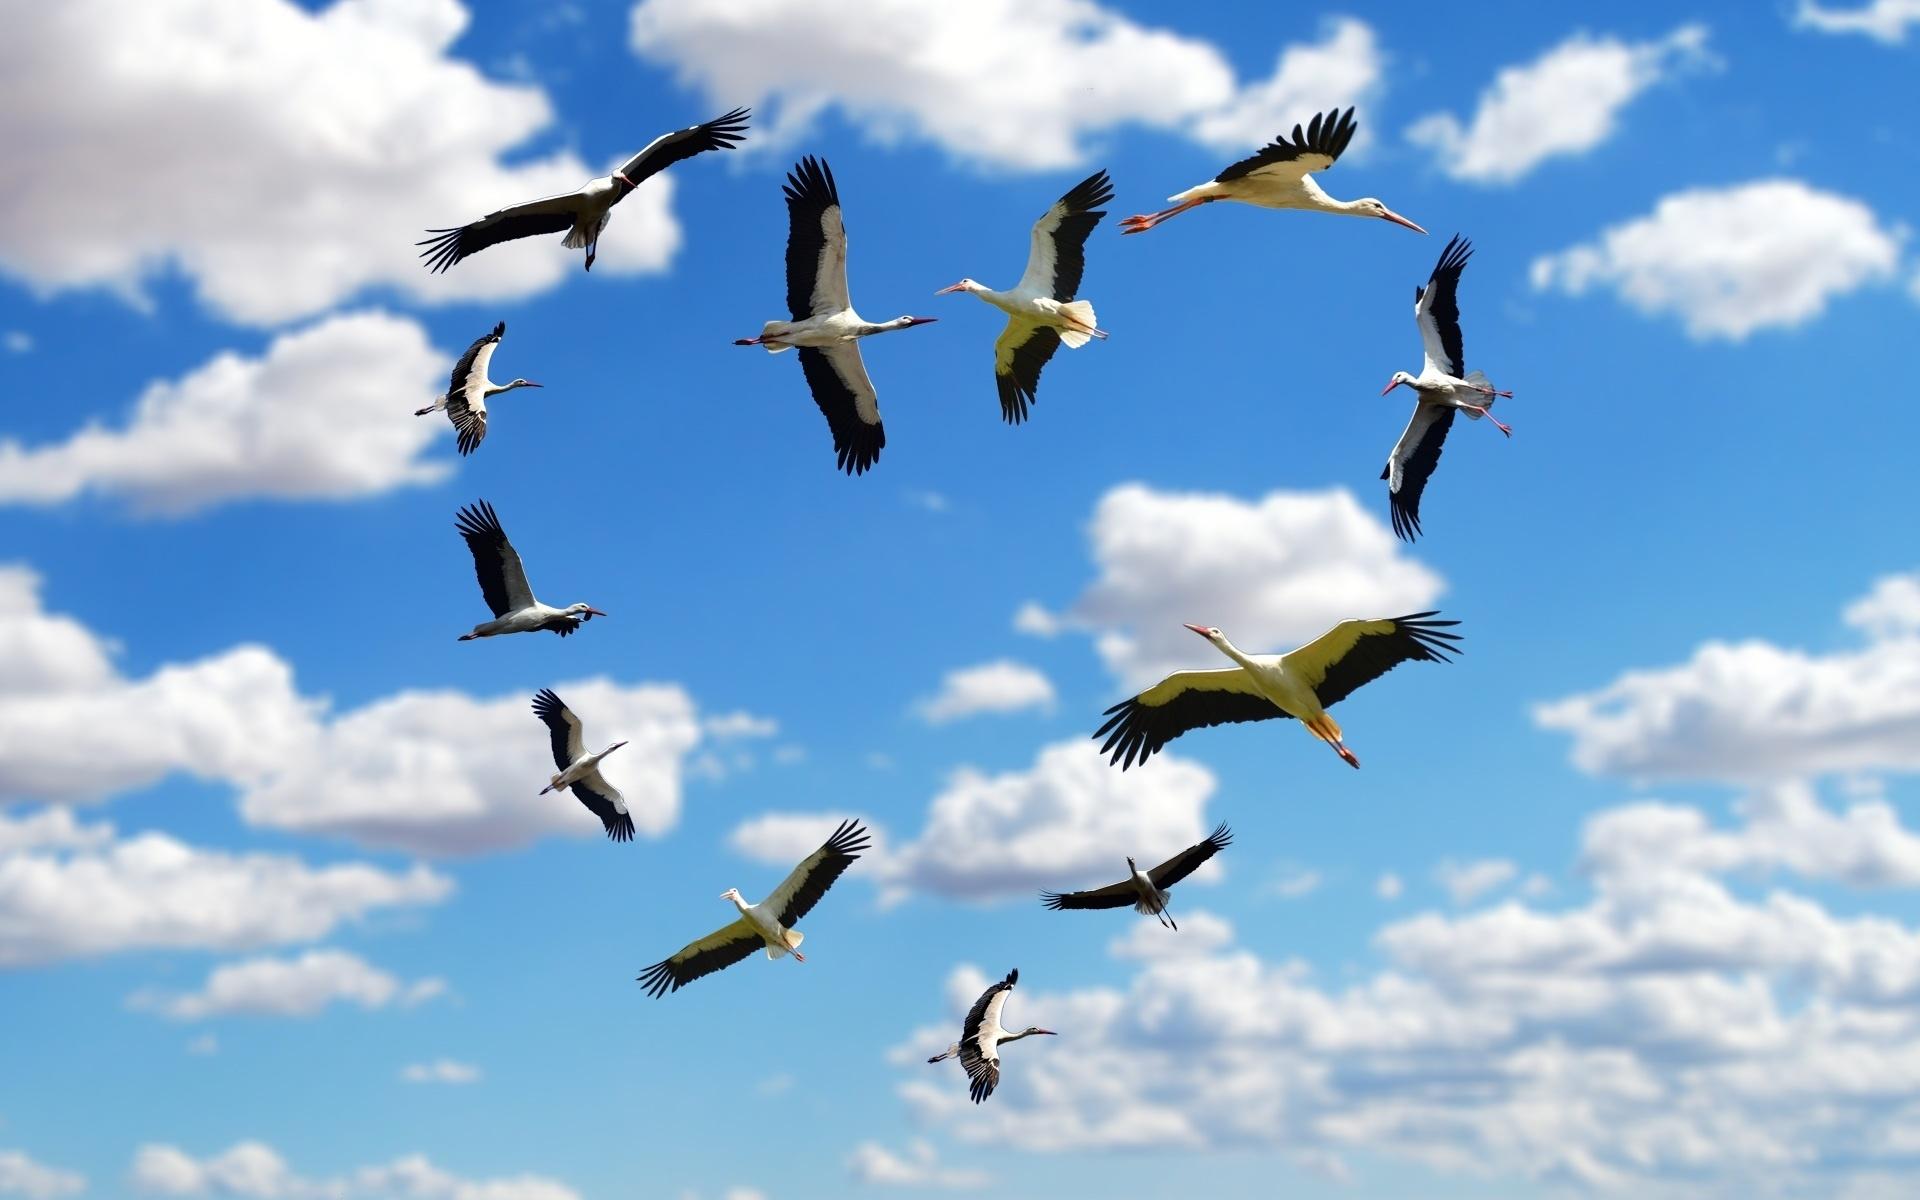 картинки с летящими птицами красивые разница вместо